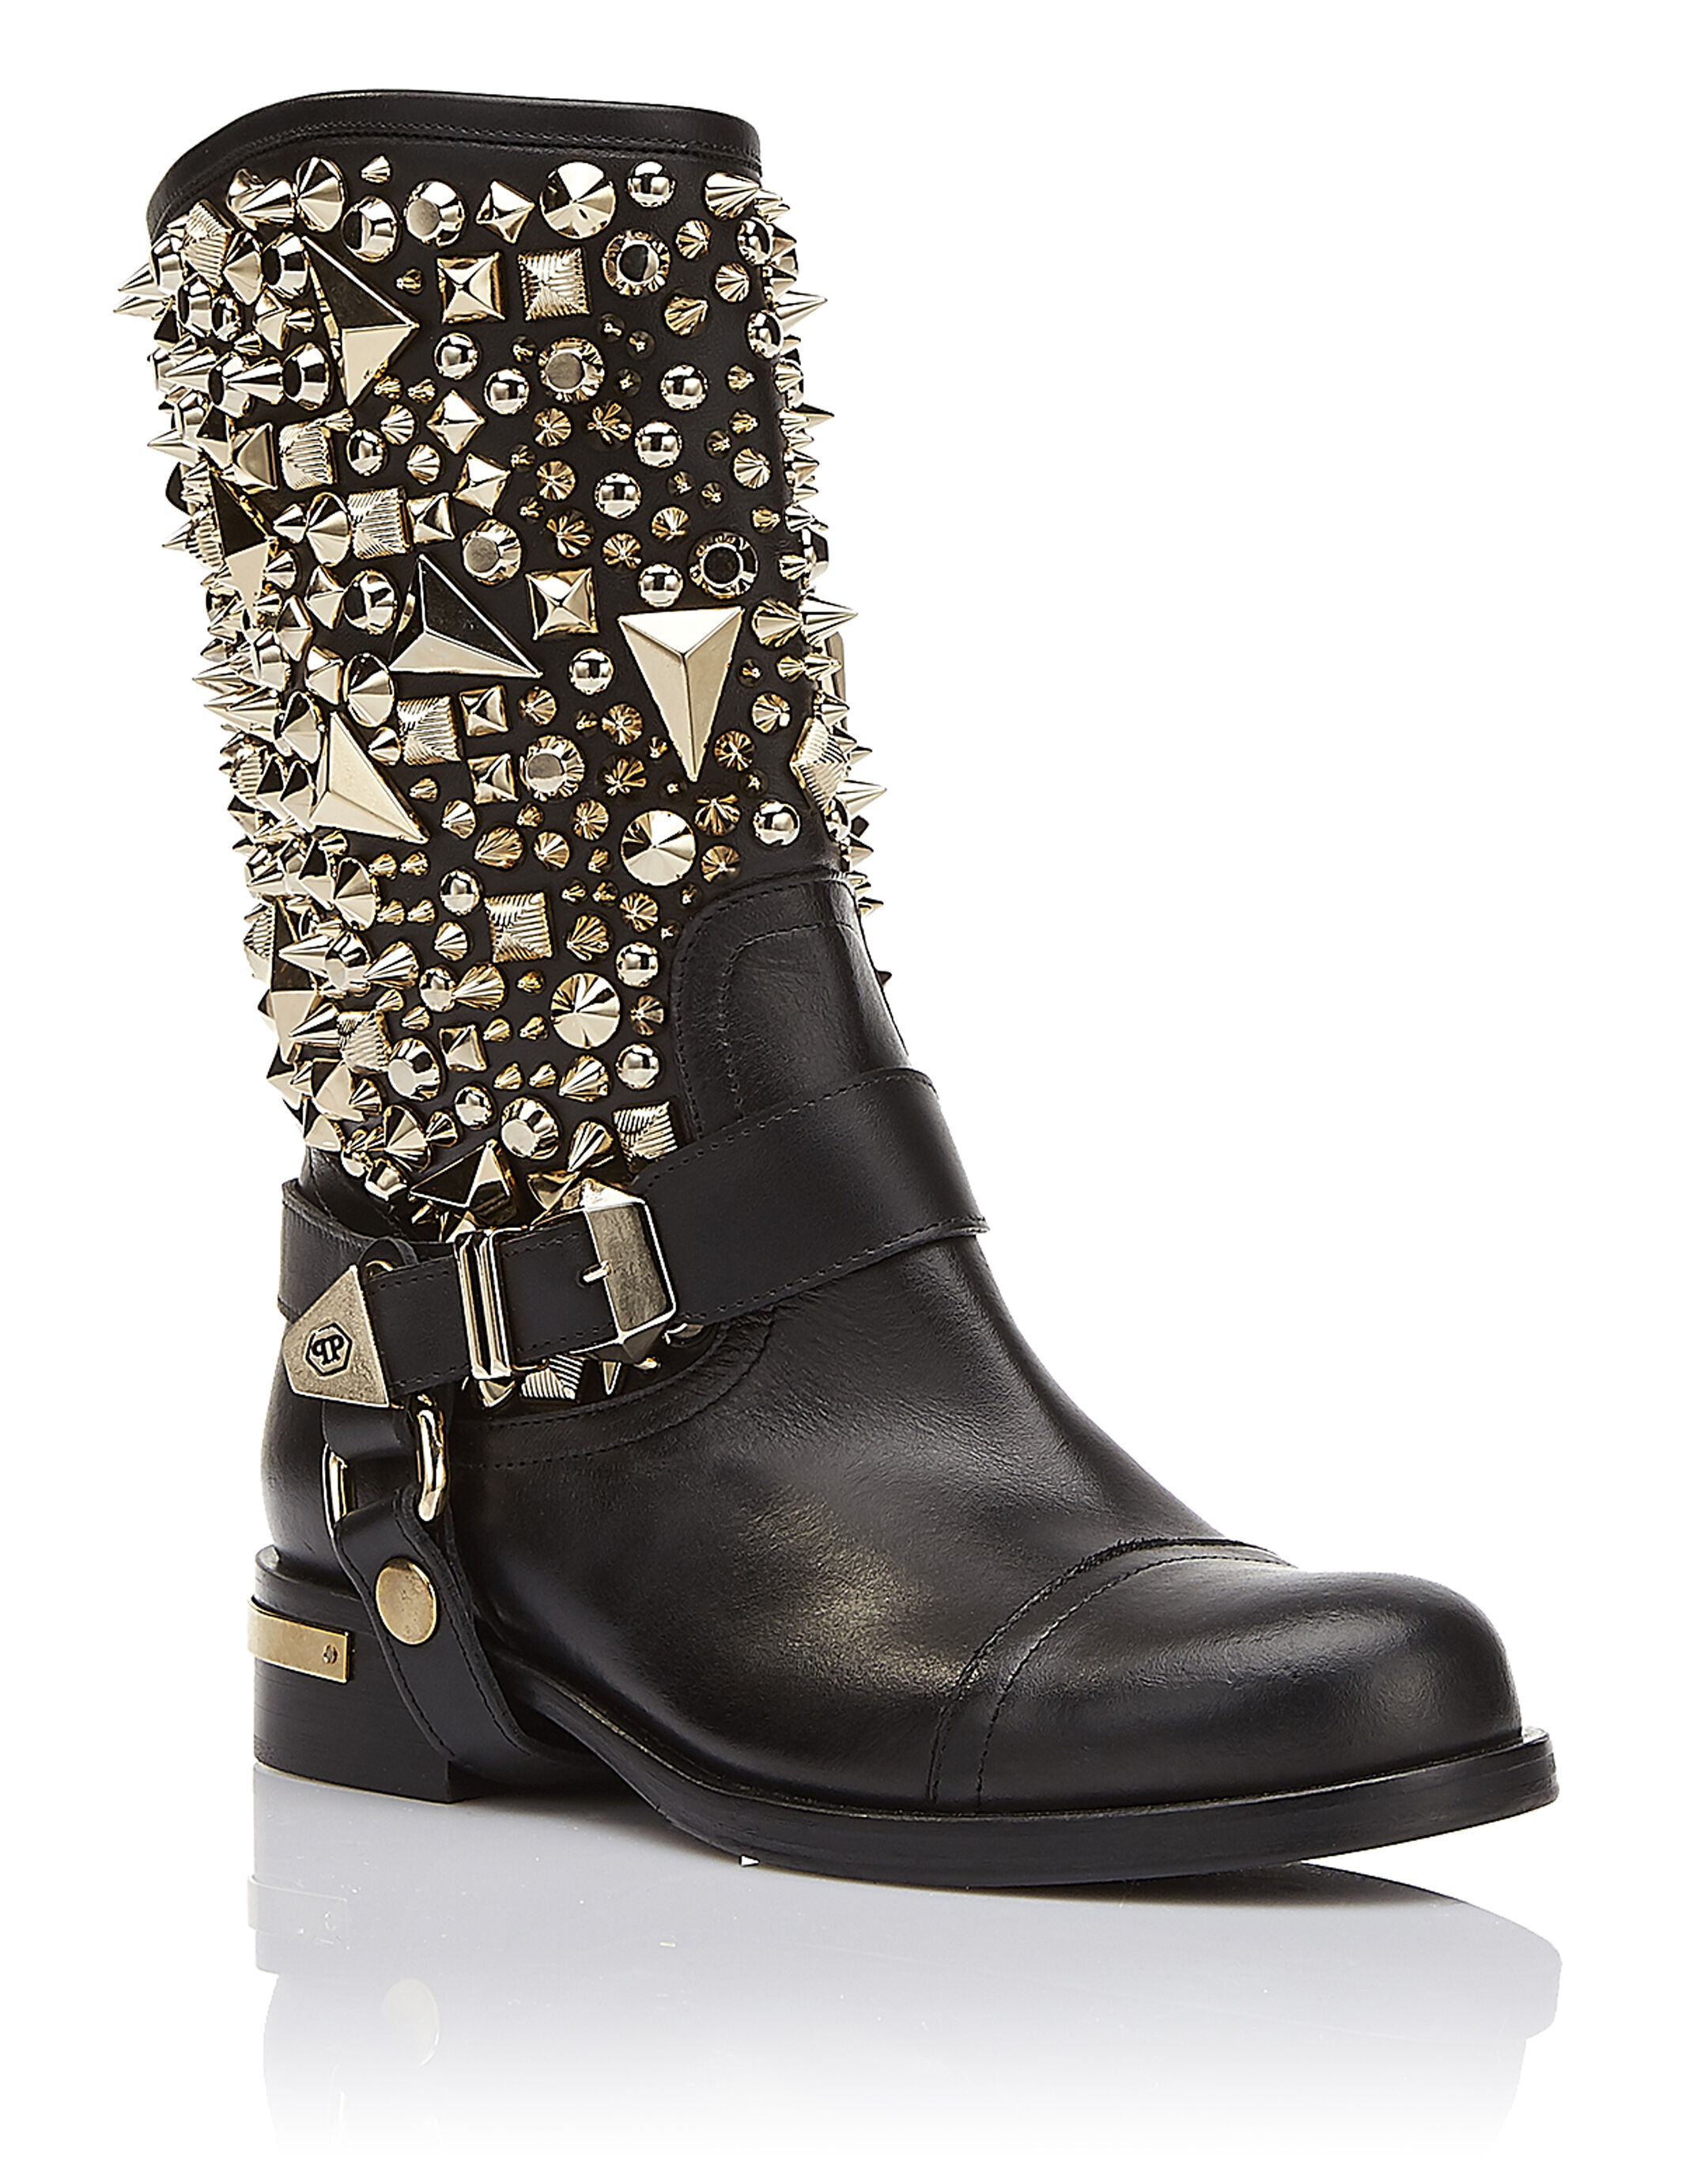 Boots Flat High Strong woman ...